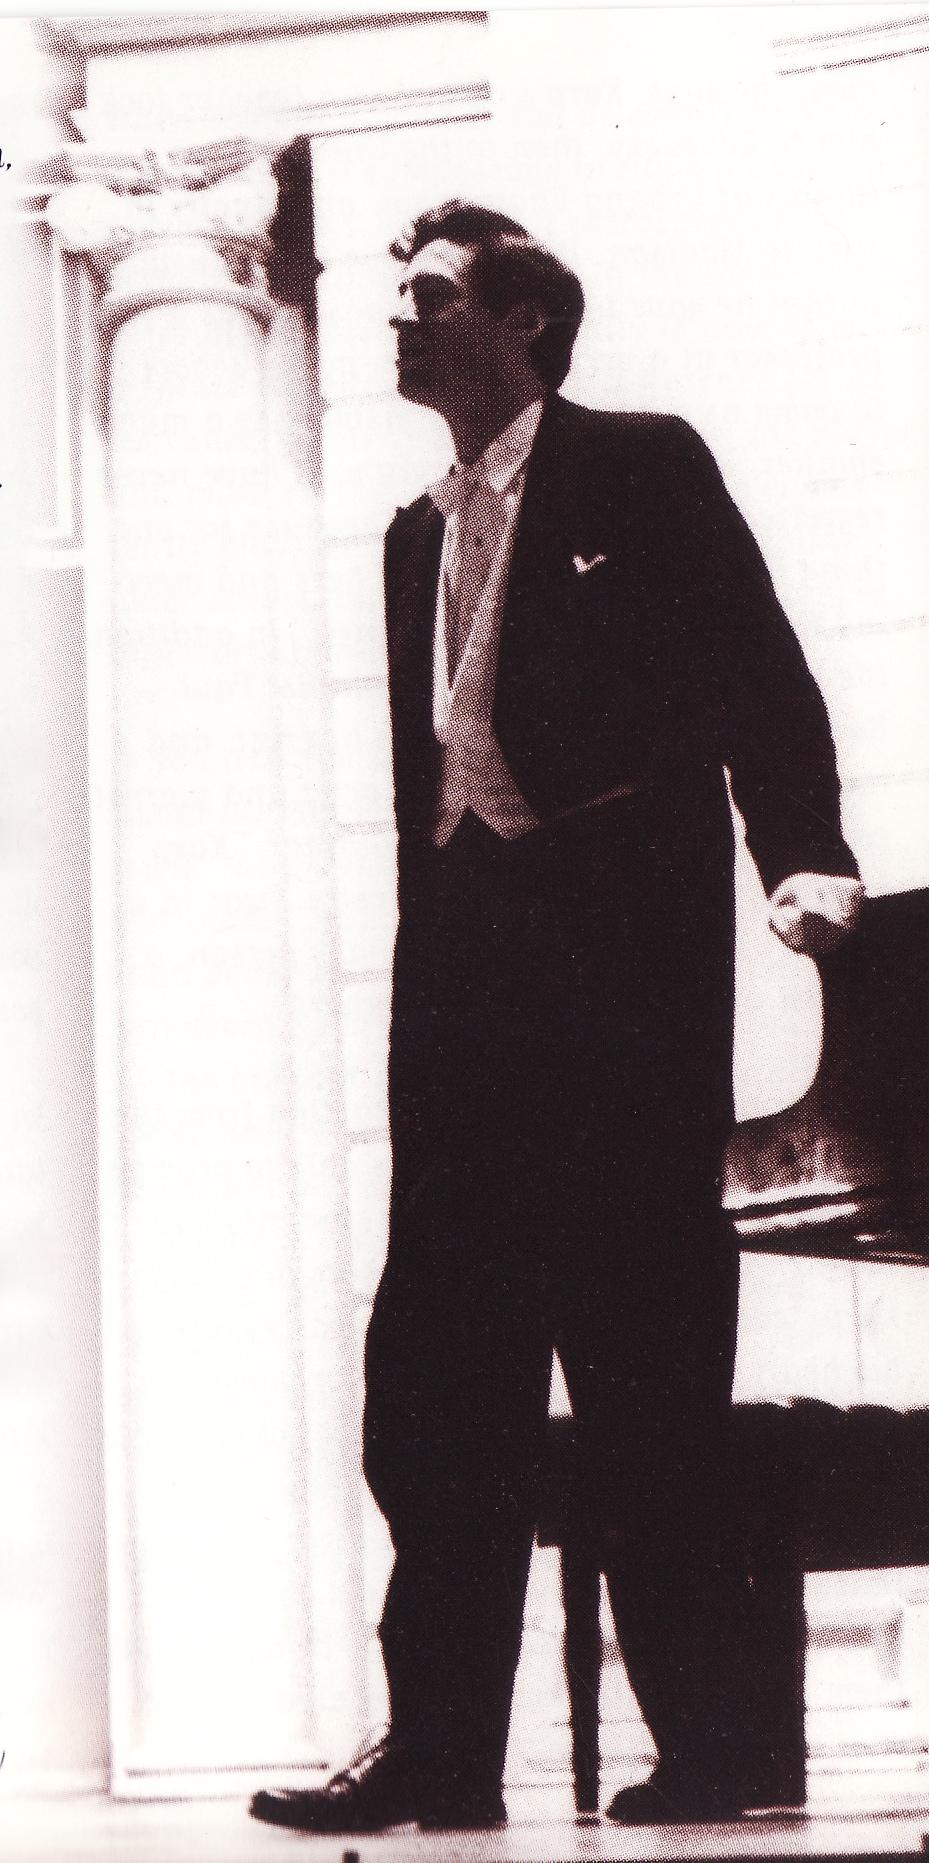 Howard Karp at the Amsterdam Concertgebouw in 1968